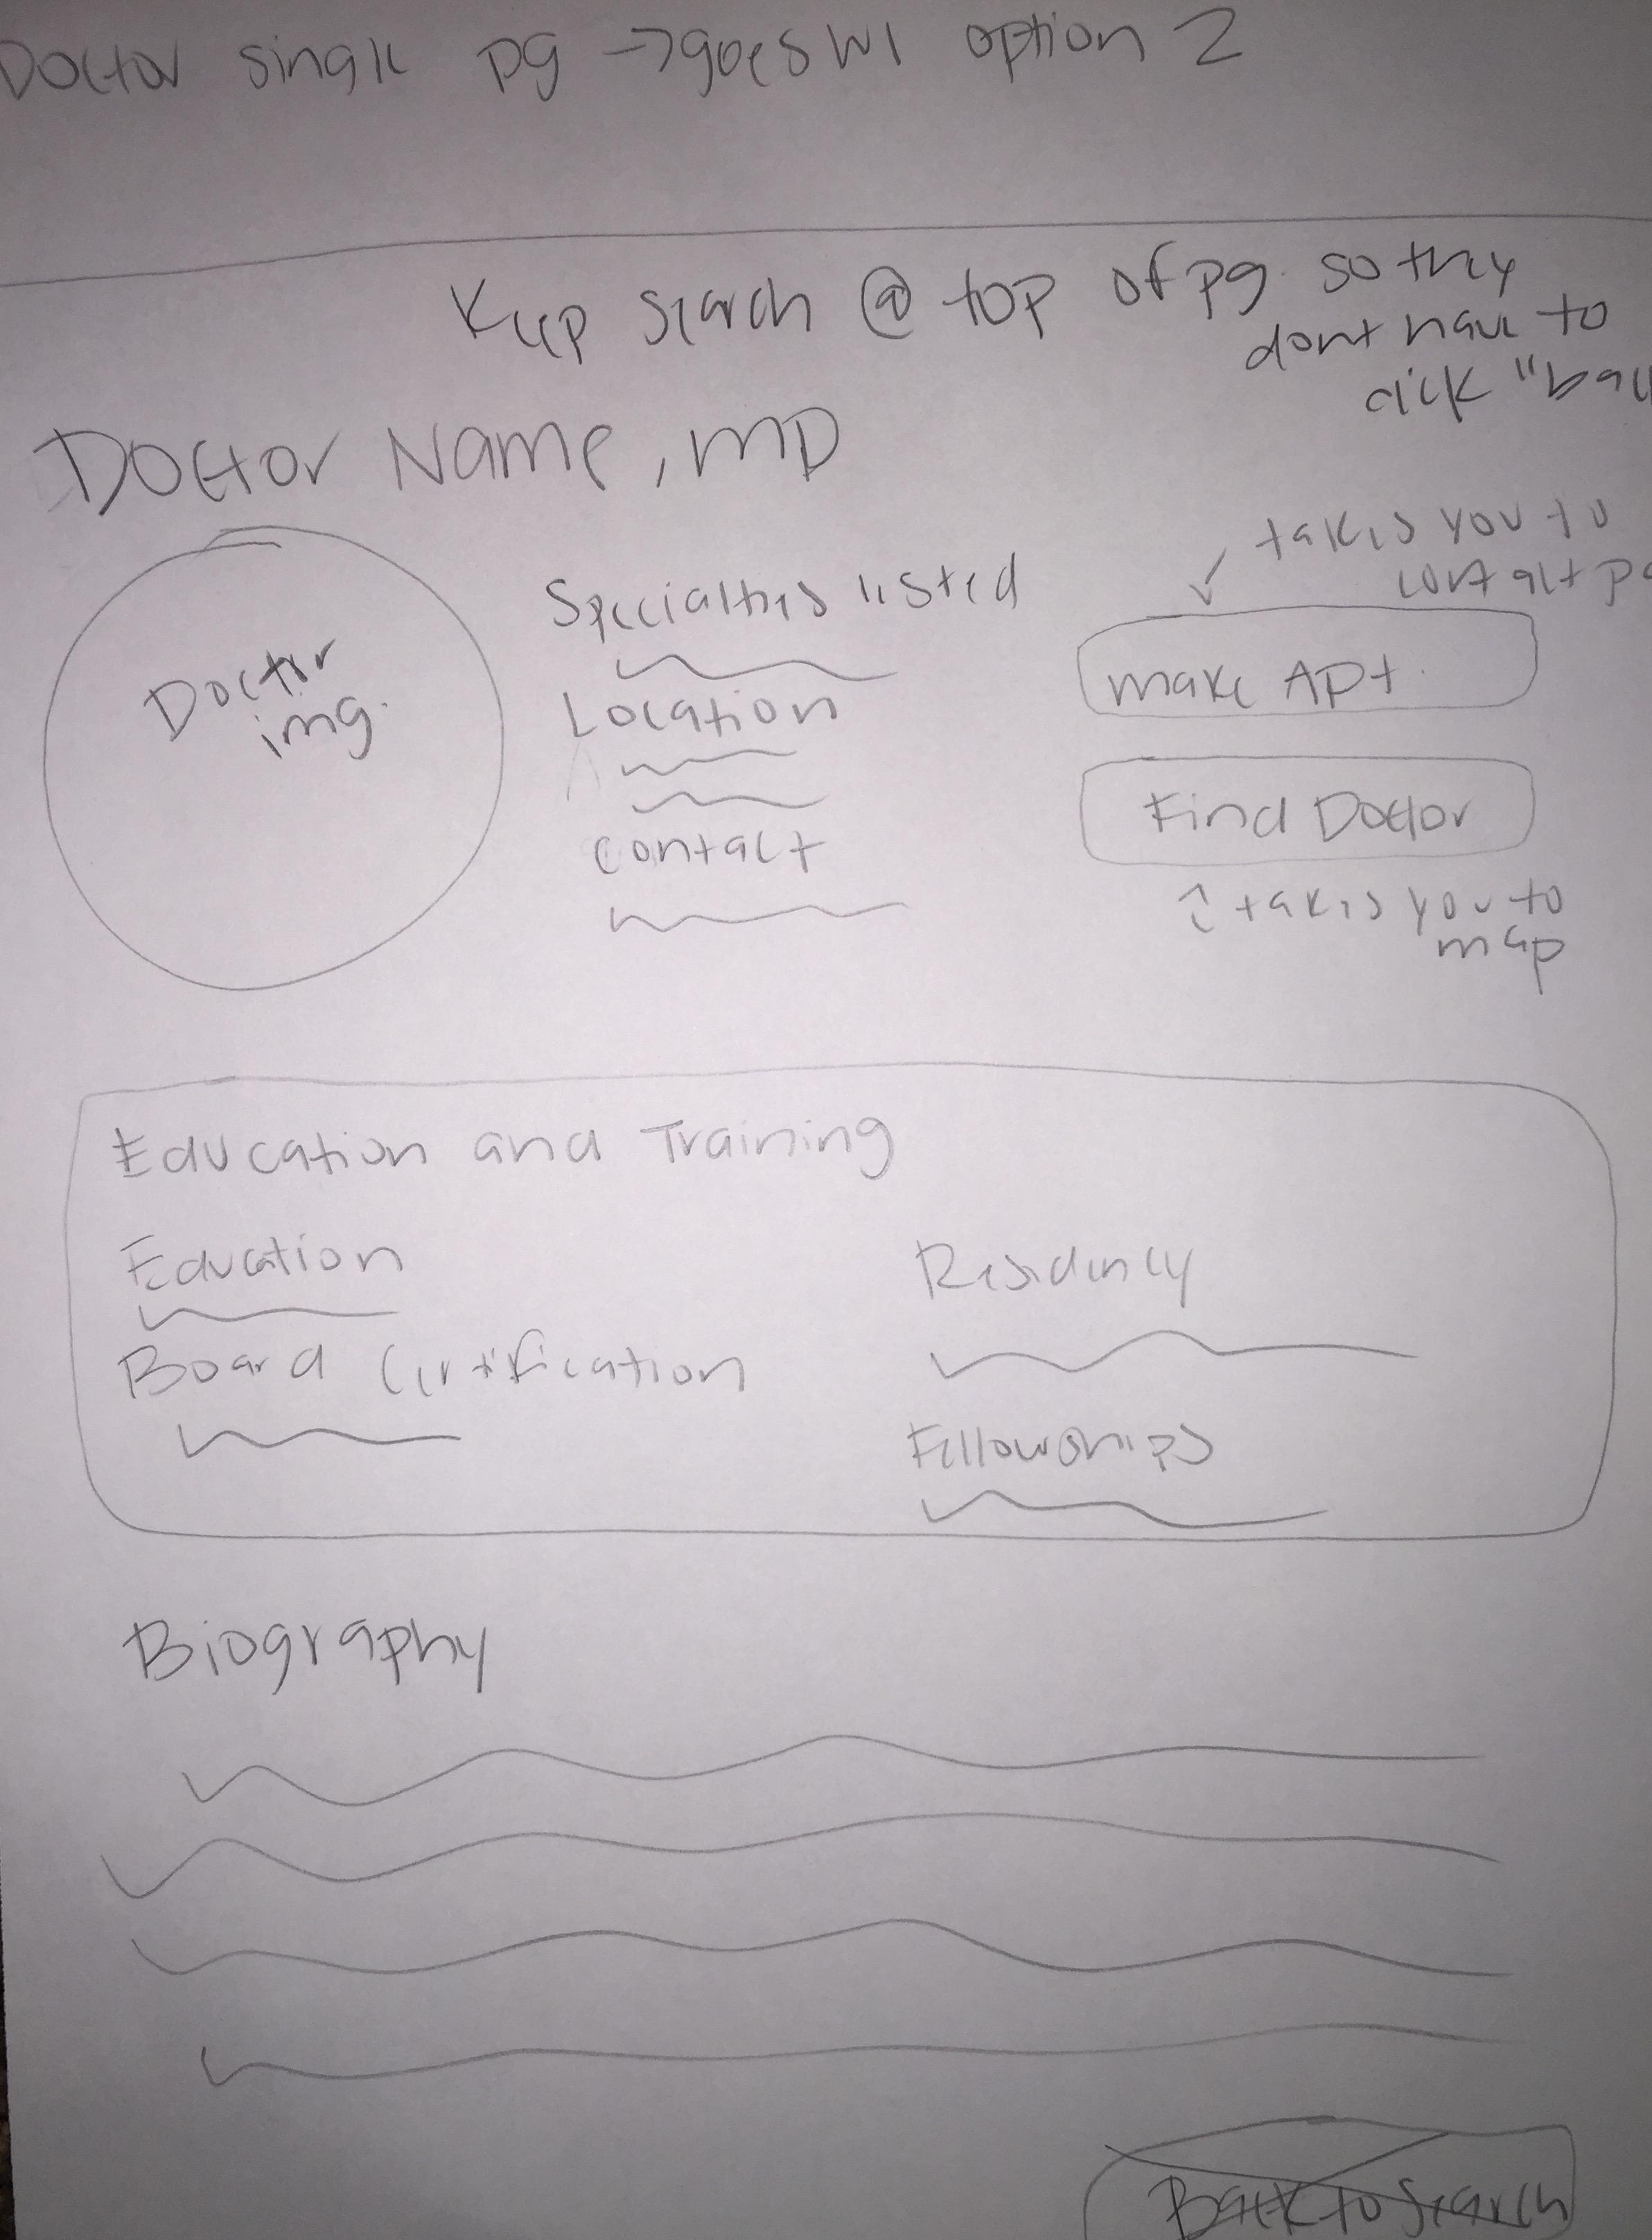 seminole-doctor-single-page-option